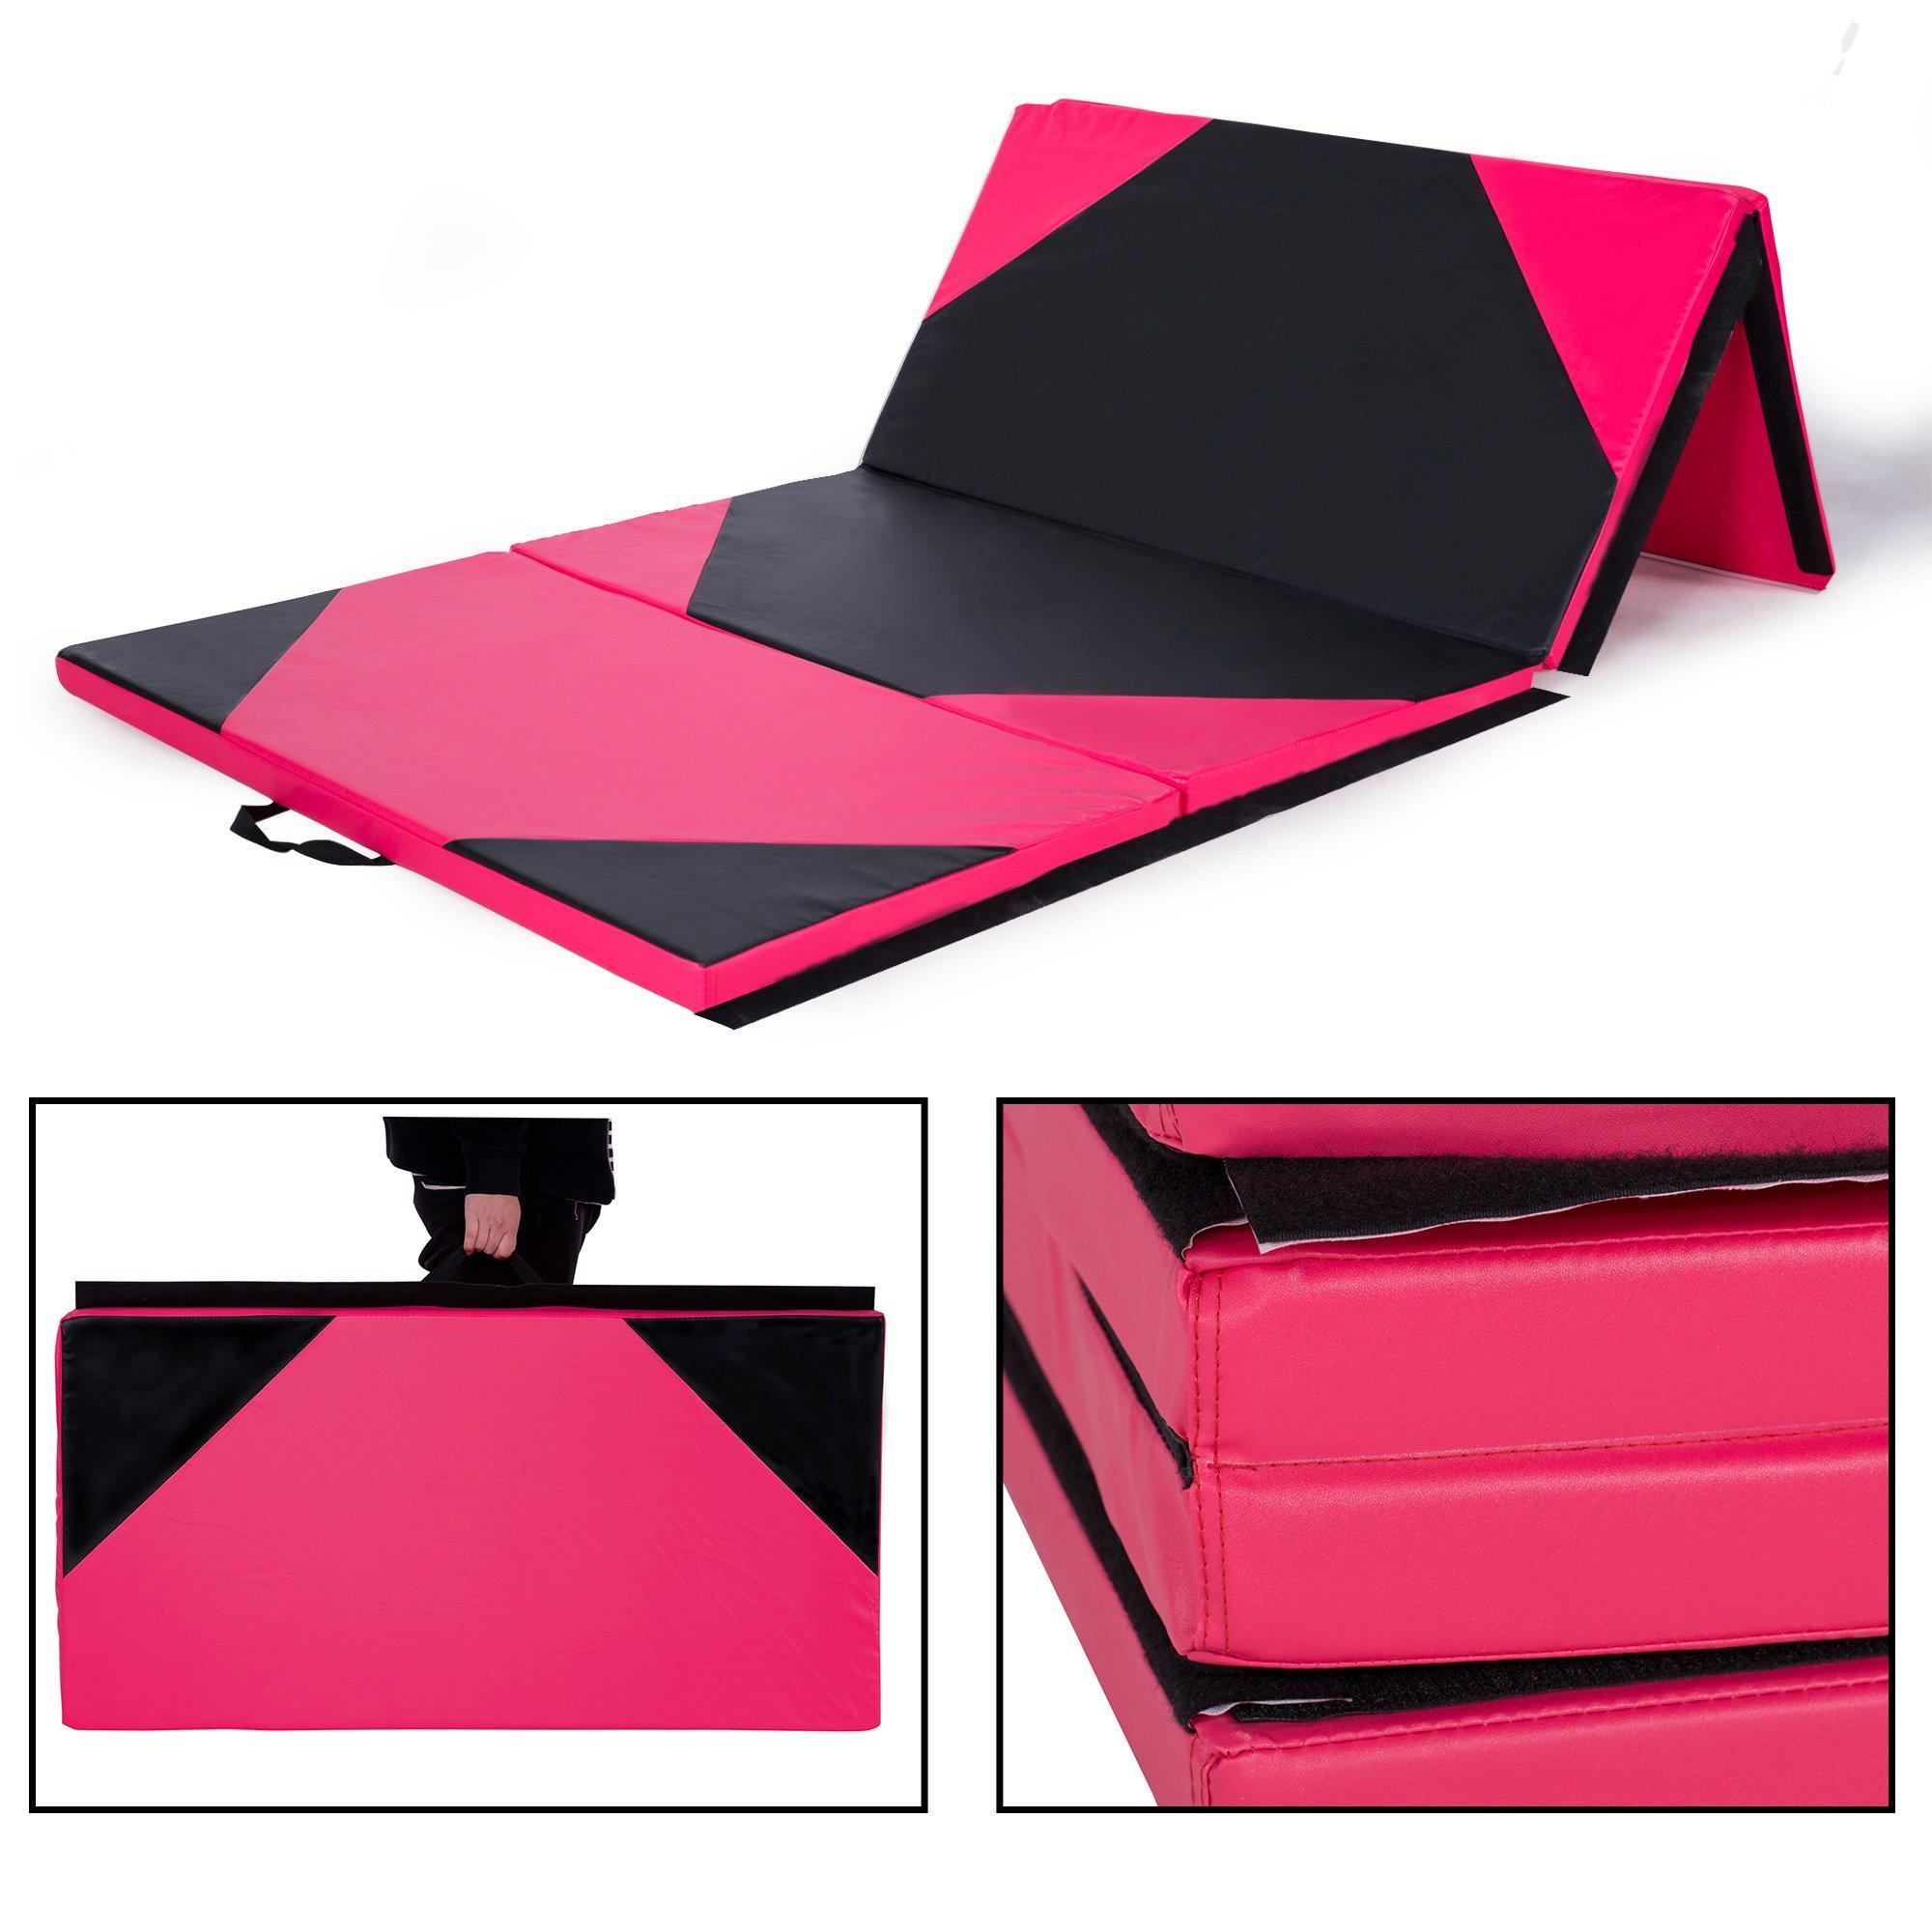 Sportmad 4'x10'x2 Thick Folding Panel Gymnastics Tumbling Mat Gym, Fitness, Exercise (Black/Pink)